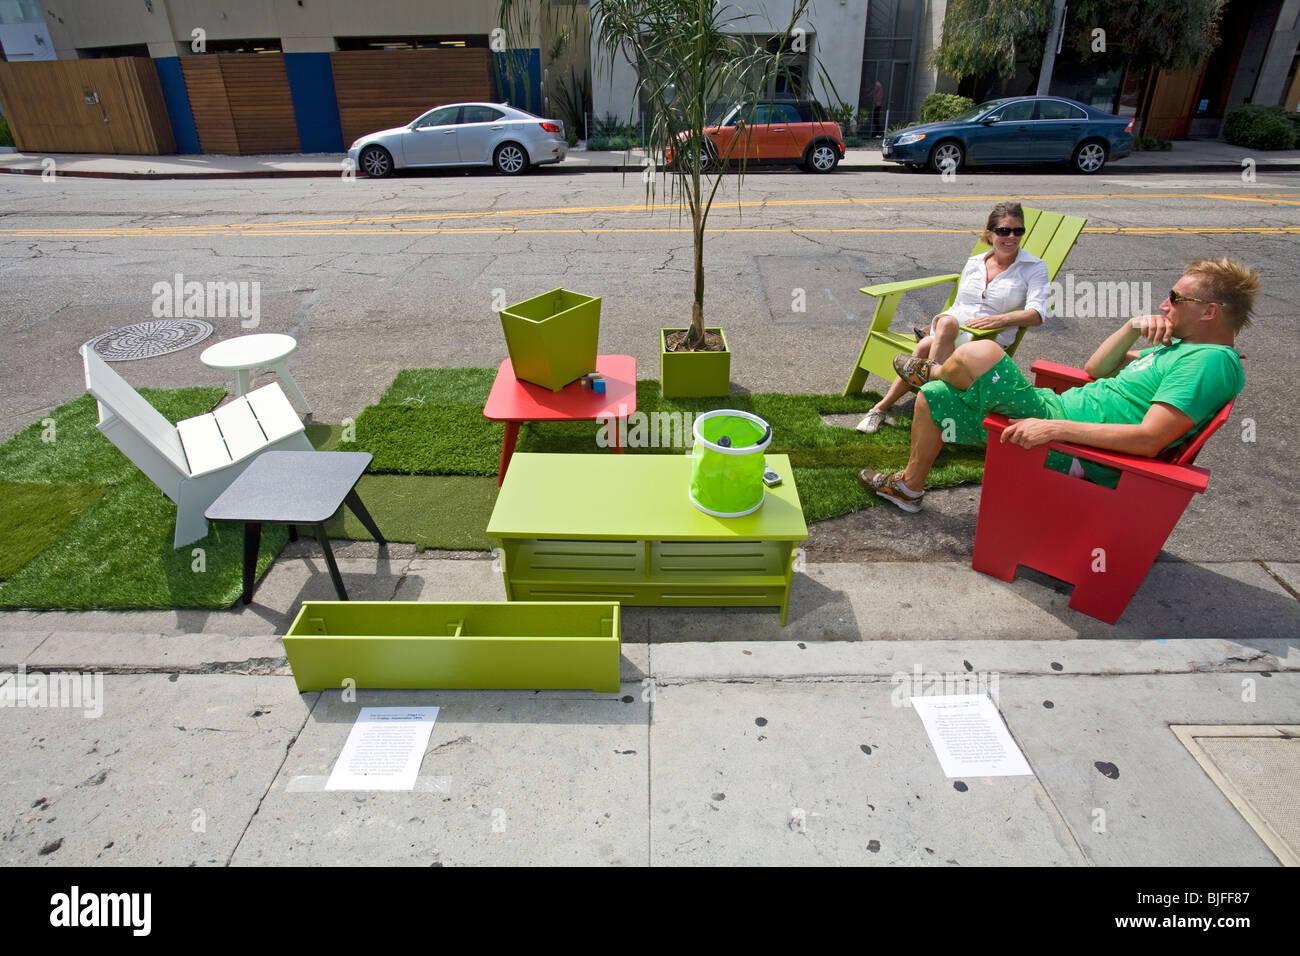 Tercer Parque anual[ing] Día ángeles, Abbot Kinney Blvd, Venecia, Los Ángeles, California Imagen De Stock